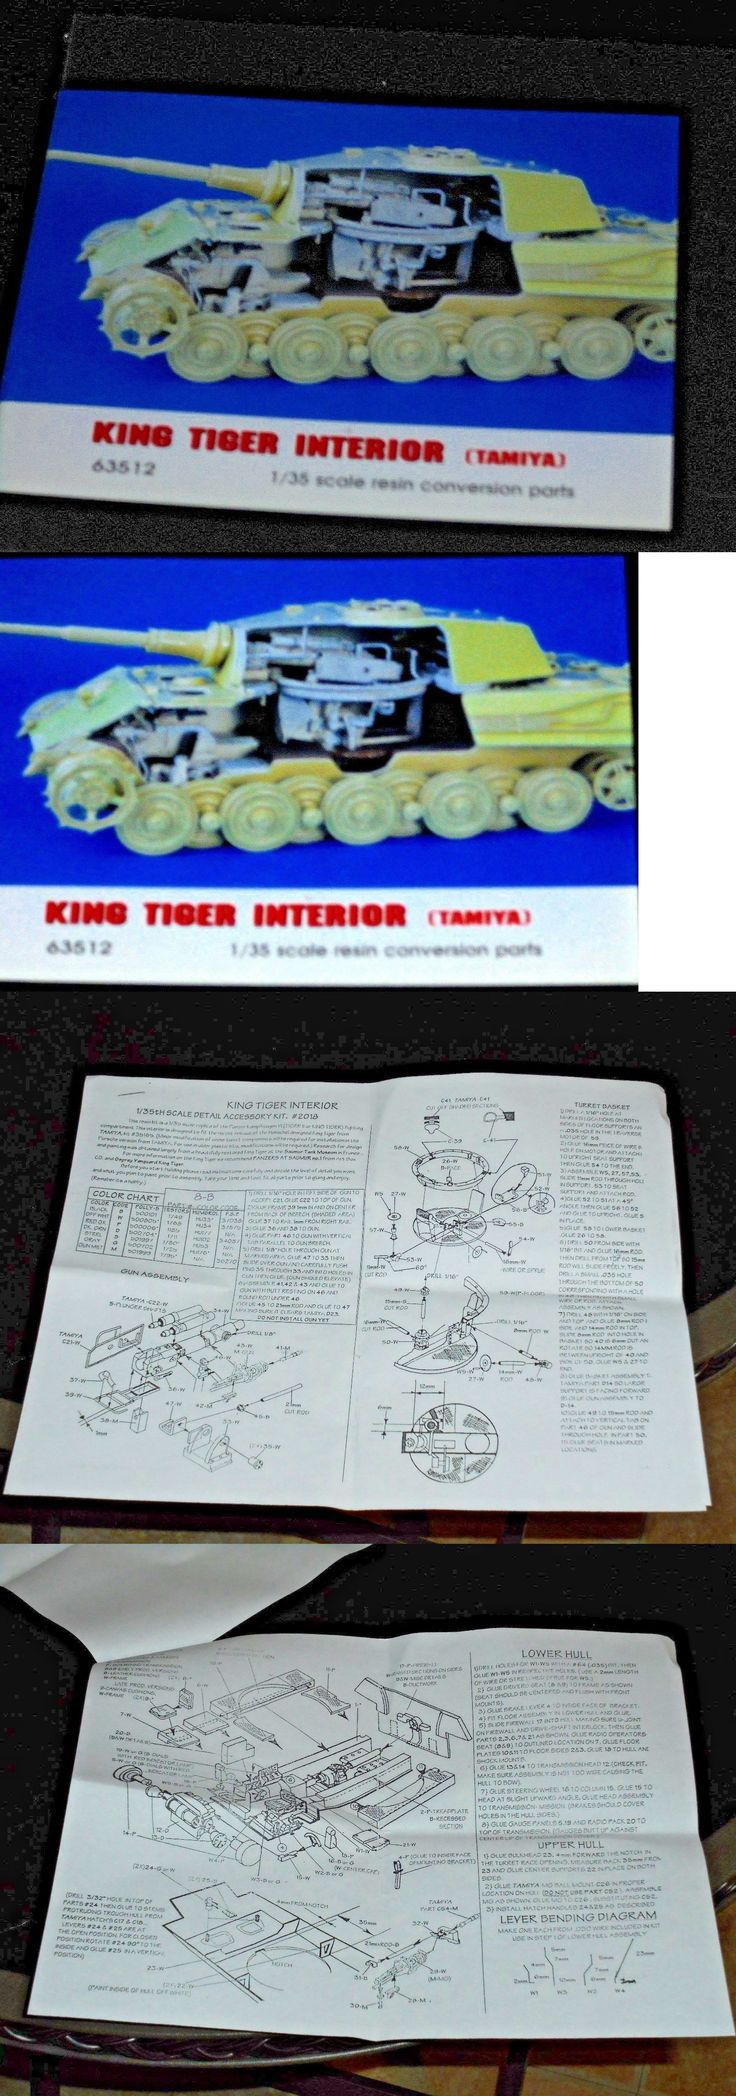 Pre-1970 734: Jaguar Models 63512 - King Tiger Interior Conversion (Tamiya) 1 35 Resin Kit -> BUY IT NOW ONLY: $41.95 on eBay!